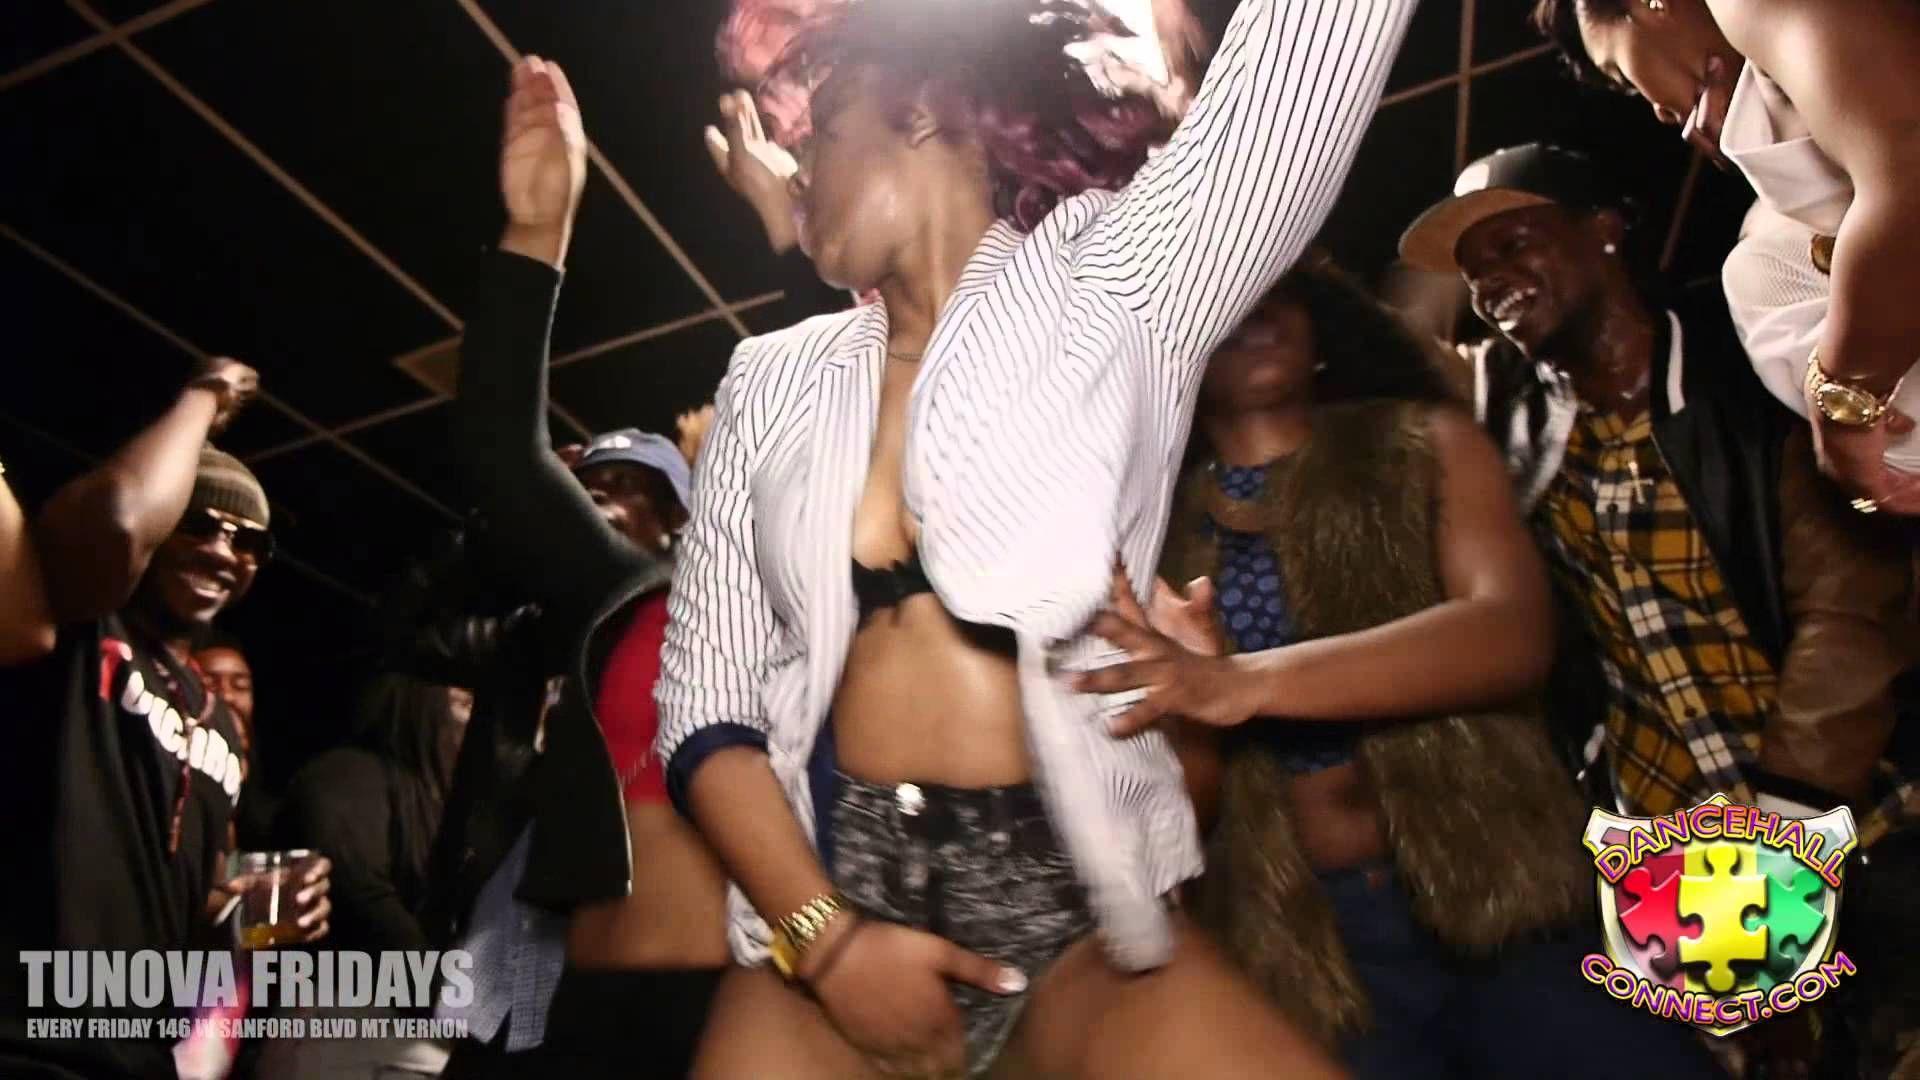 Pussy dance videos #7